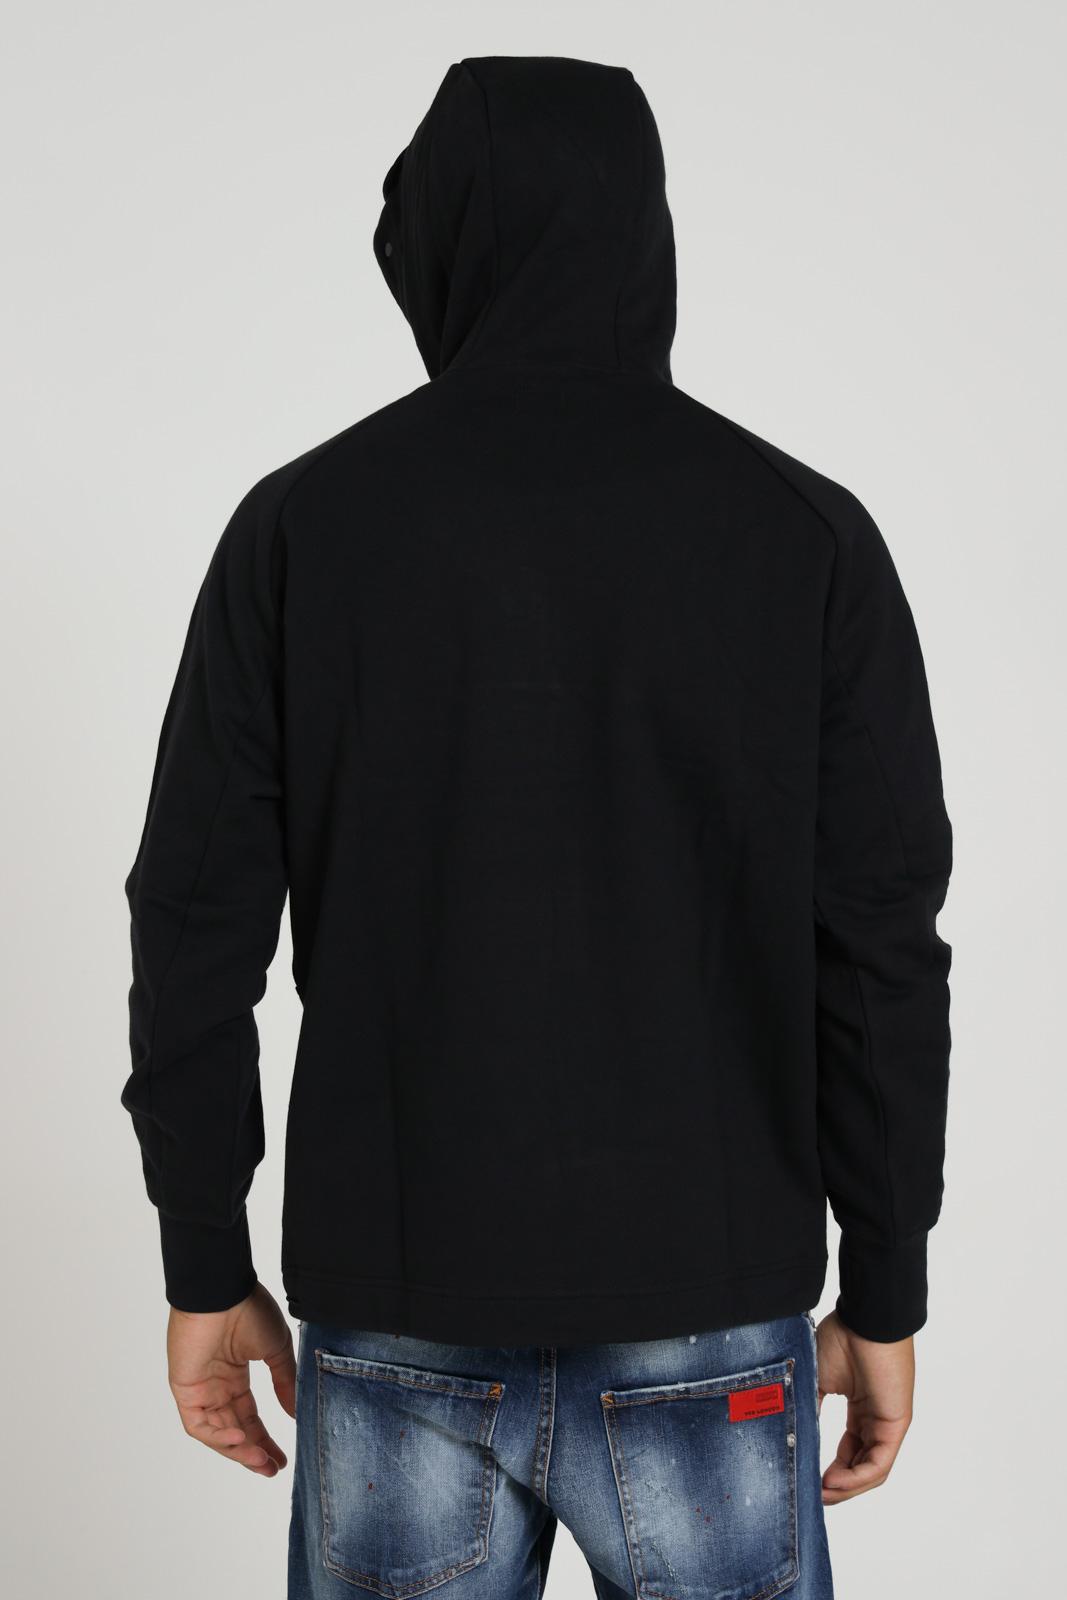 C.P. COMPANY | Sweatshirt | 09CMOW043A-005784A999